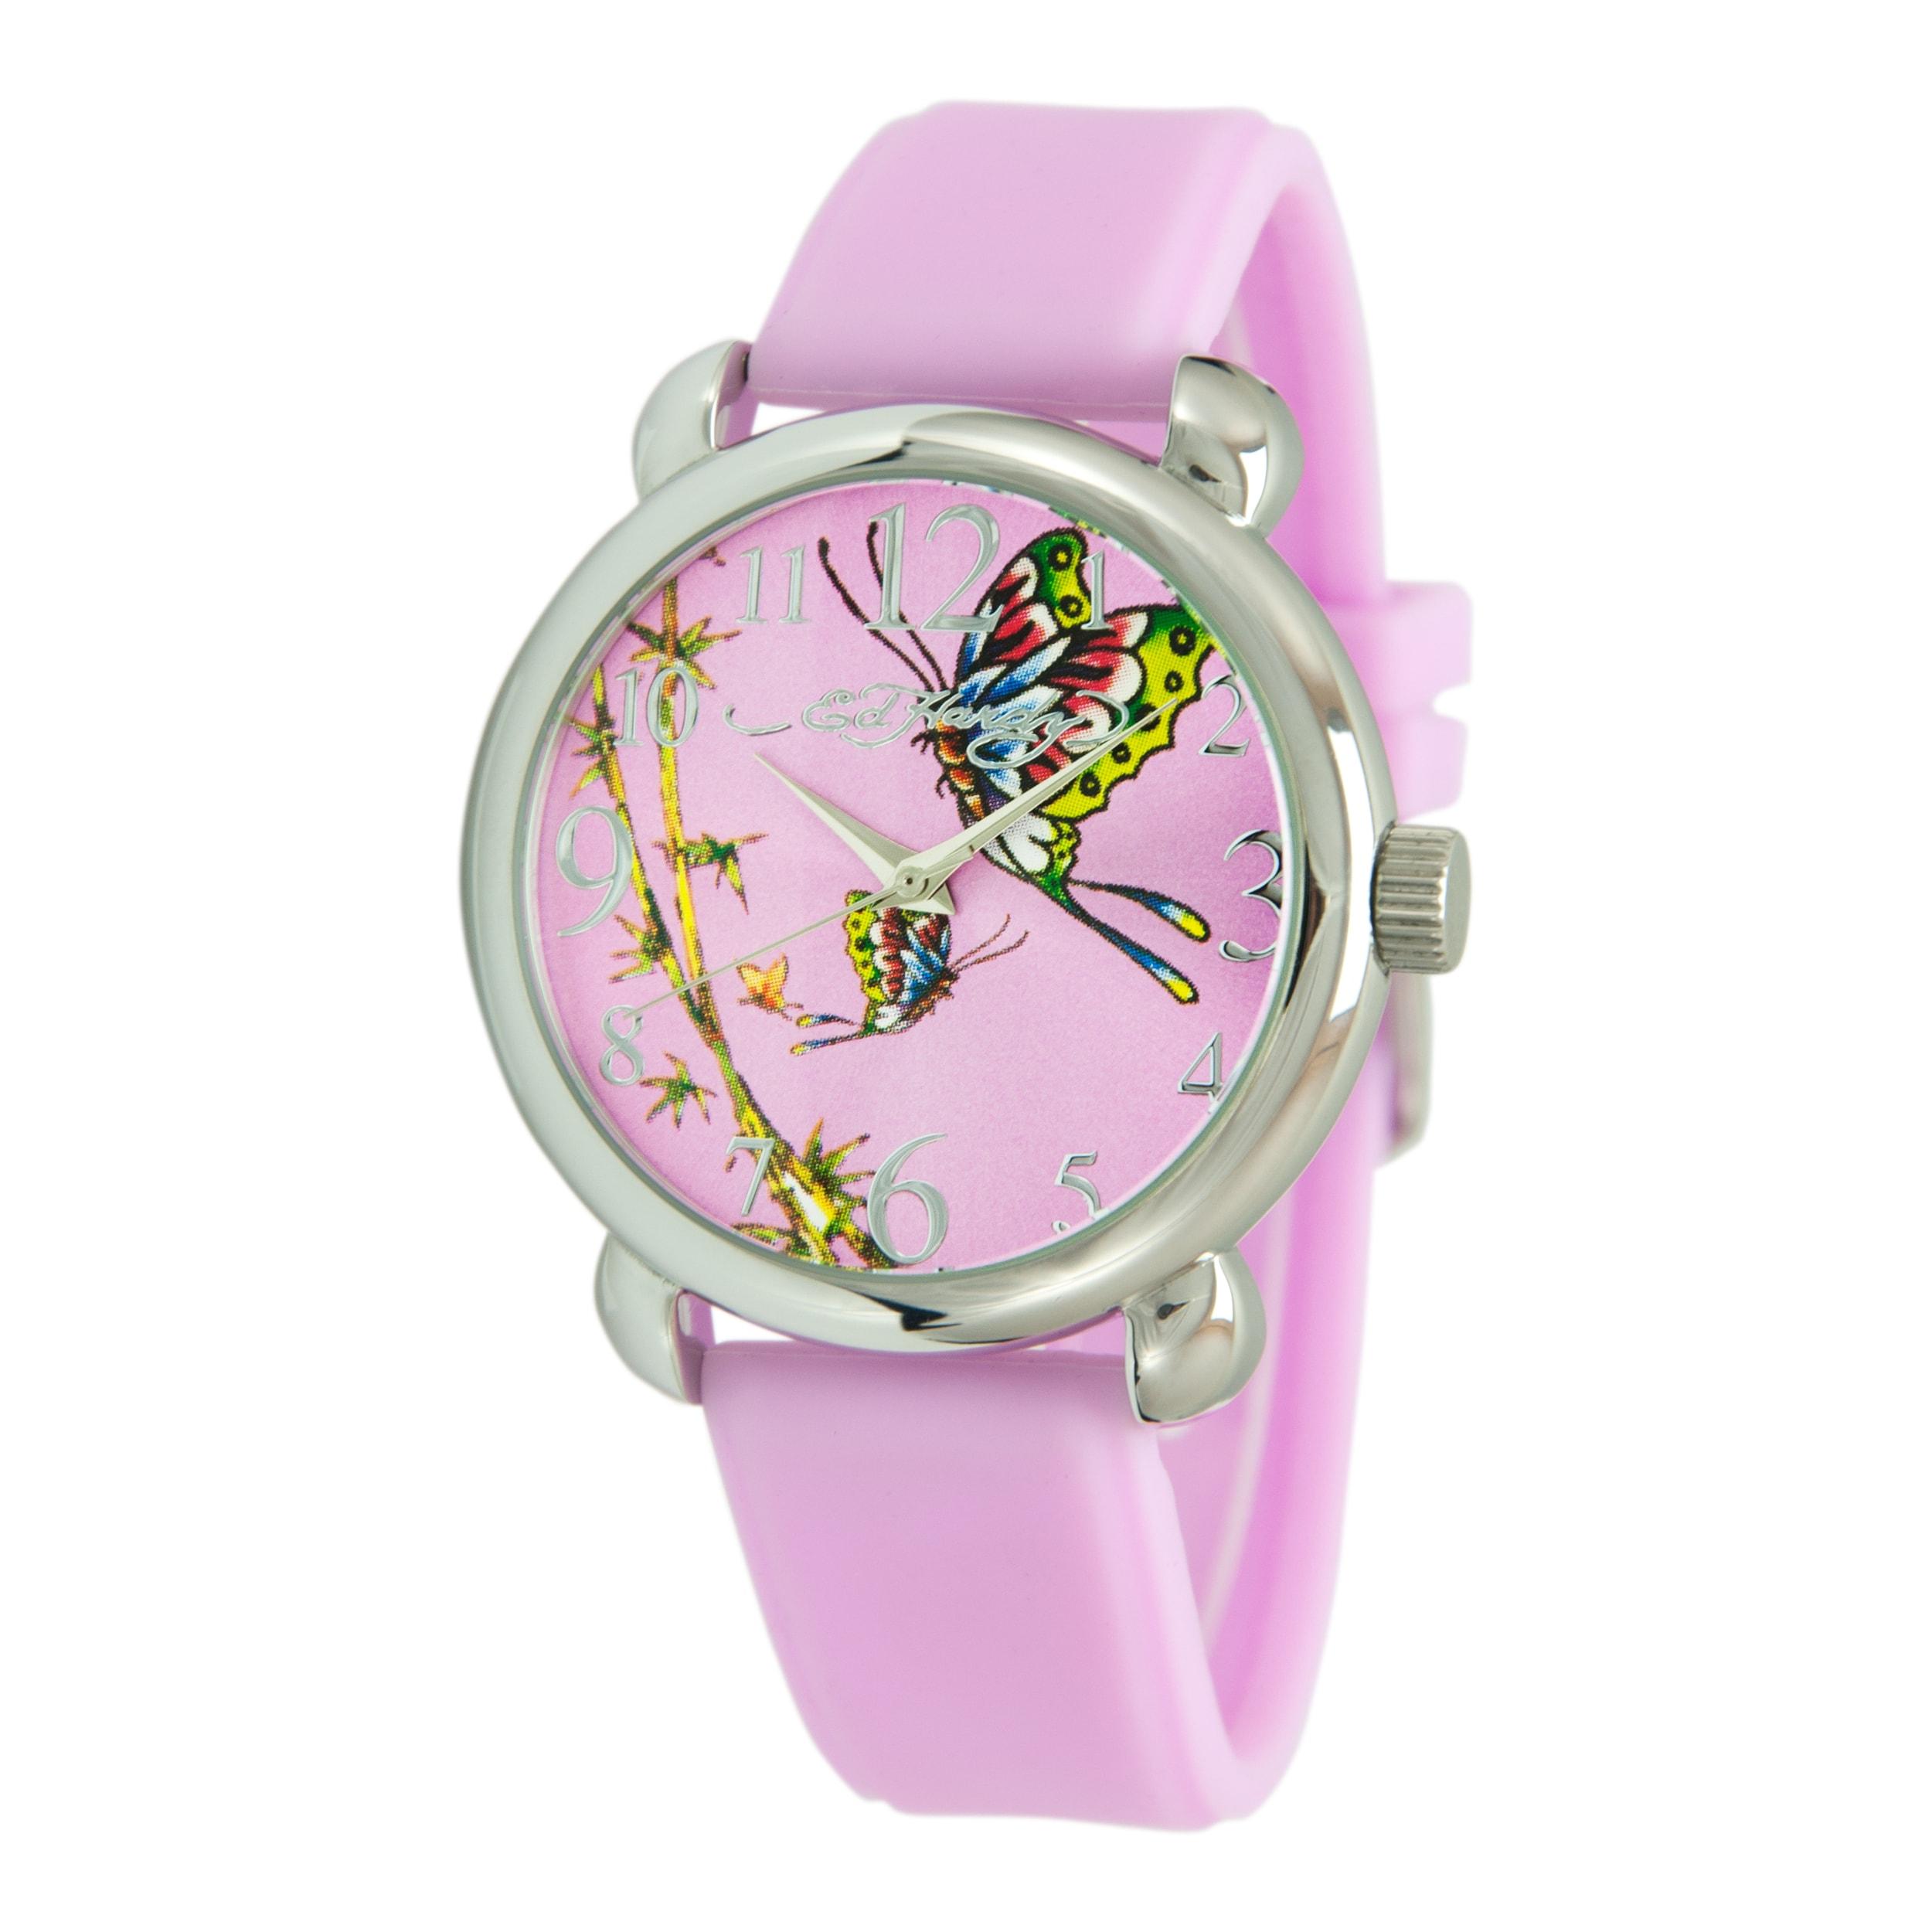 Ed Hardy Women's Fountain Pink Watch